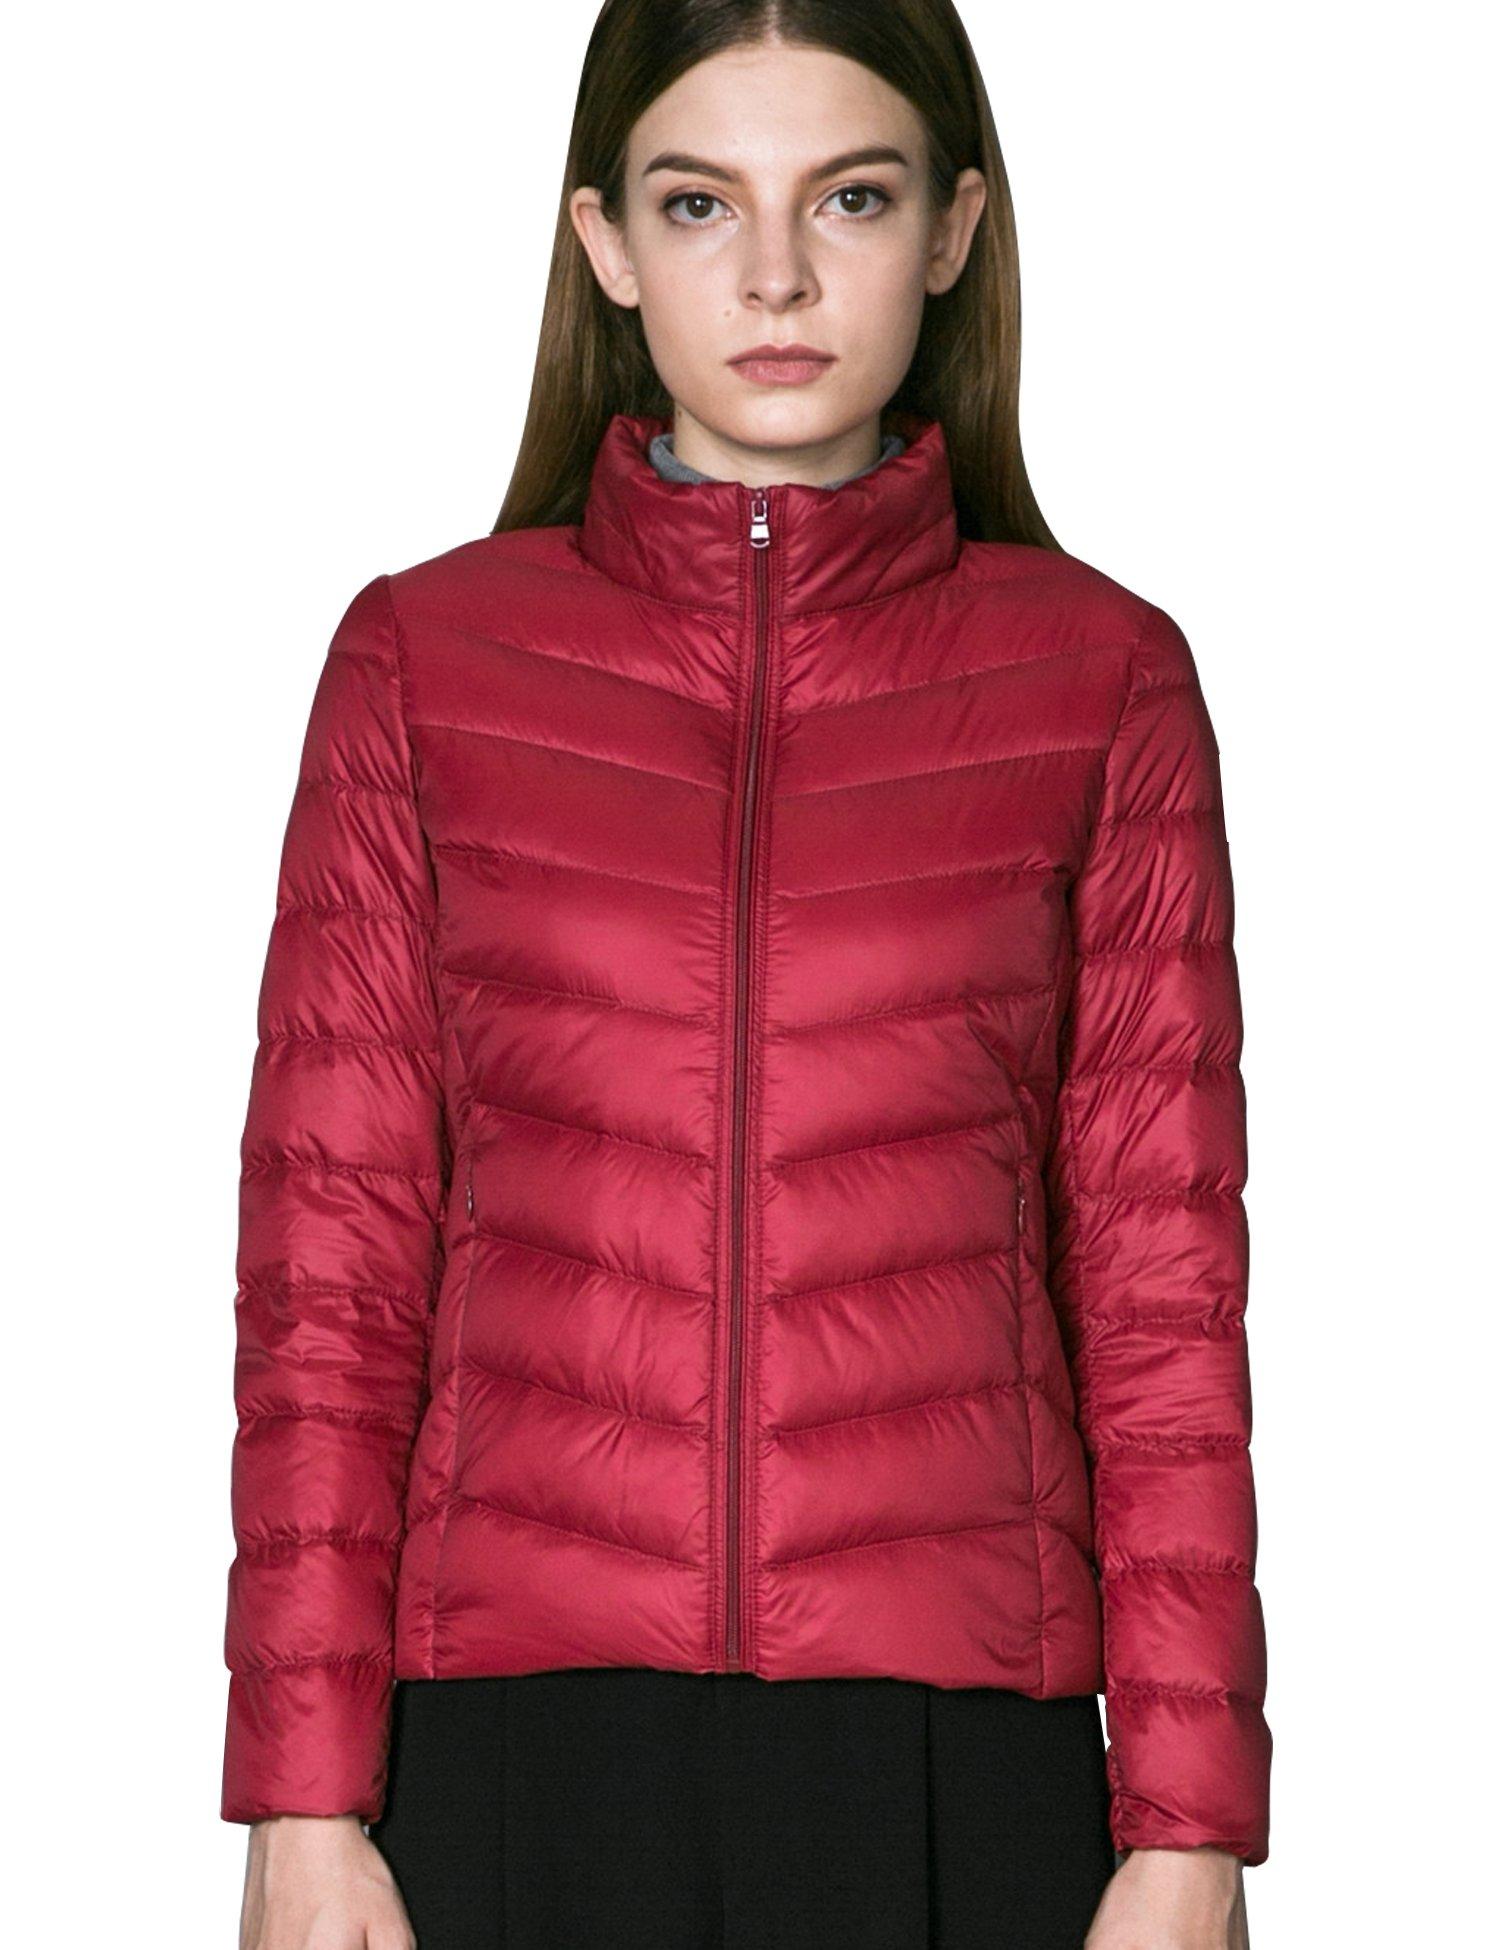 CHERRY CHICK Women's Light Puffer Down Jacket (S, Red-LD)